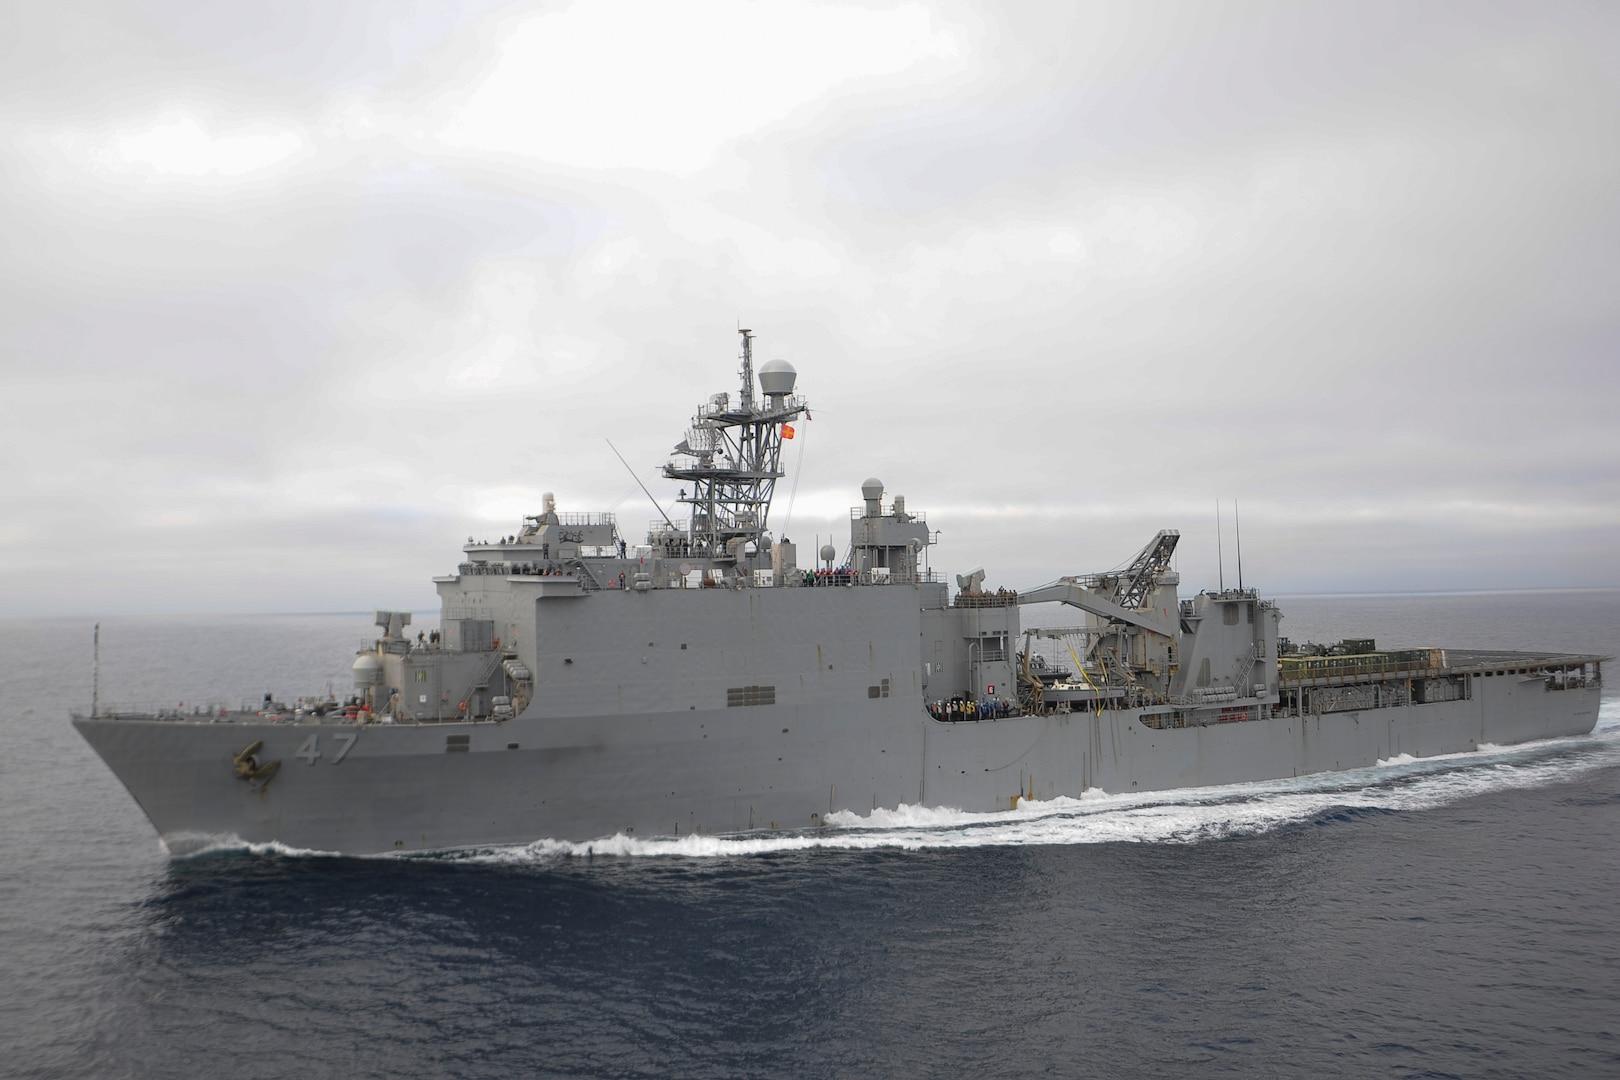 File photo of USS Rushmore (LSD 47)